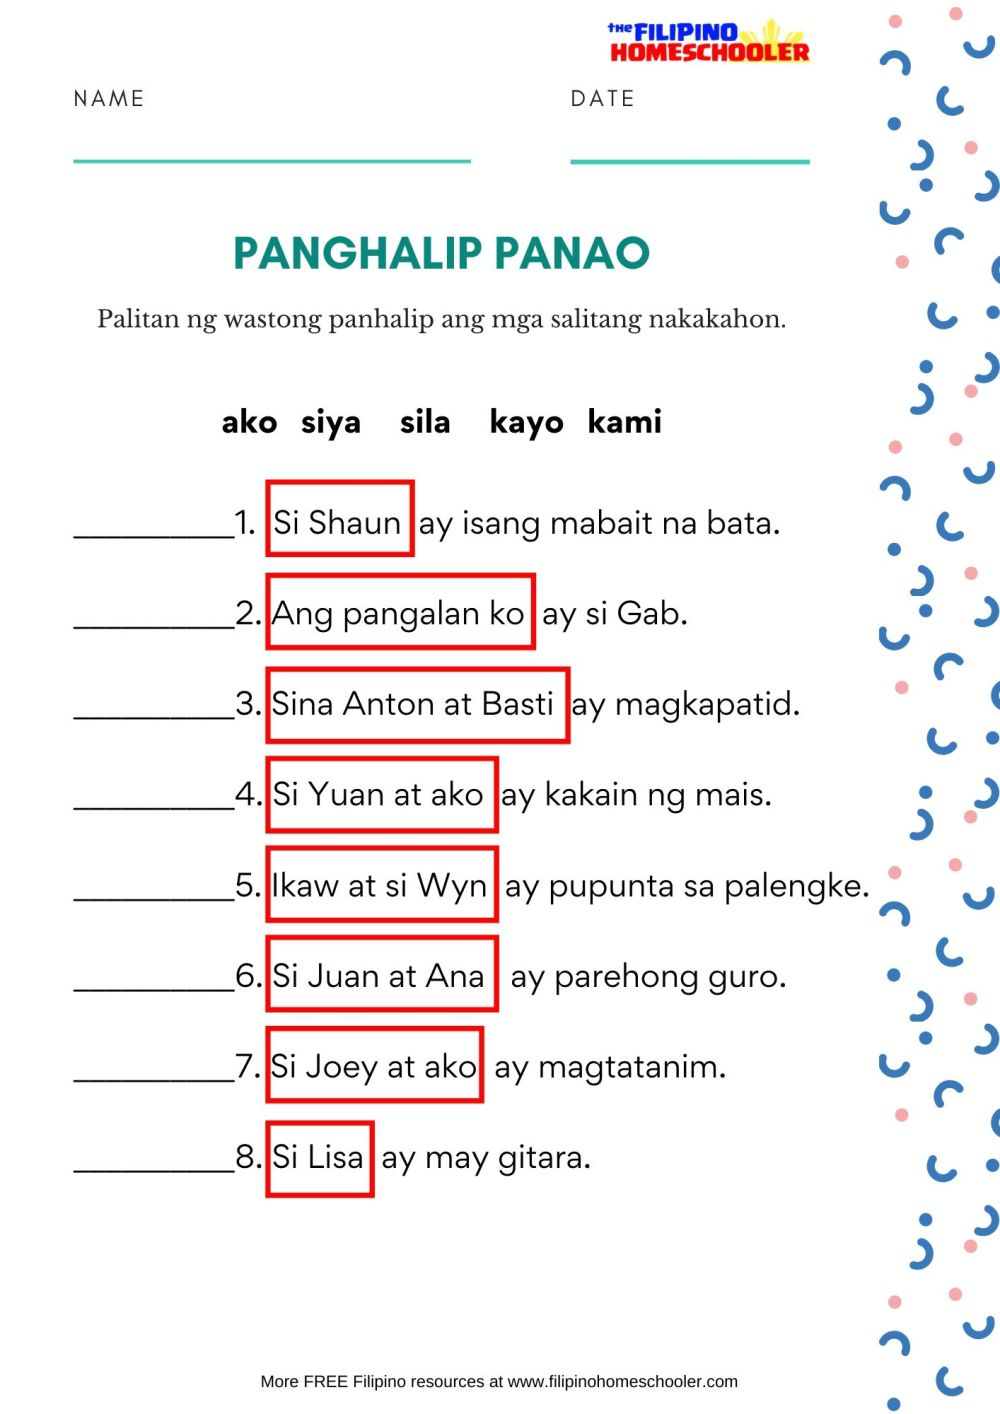 medium resolution of Free Panghalip Panao Worksheet SET 2 — The Filipino Homeschooler